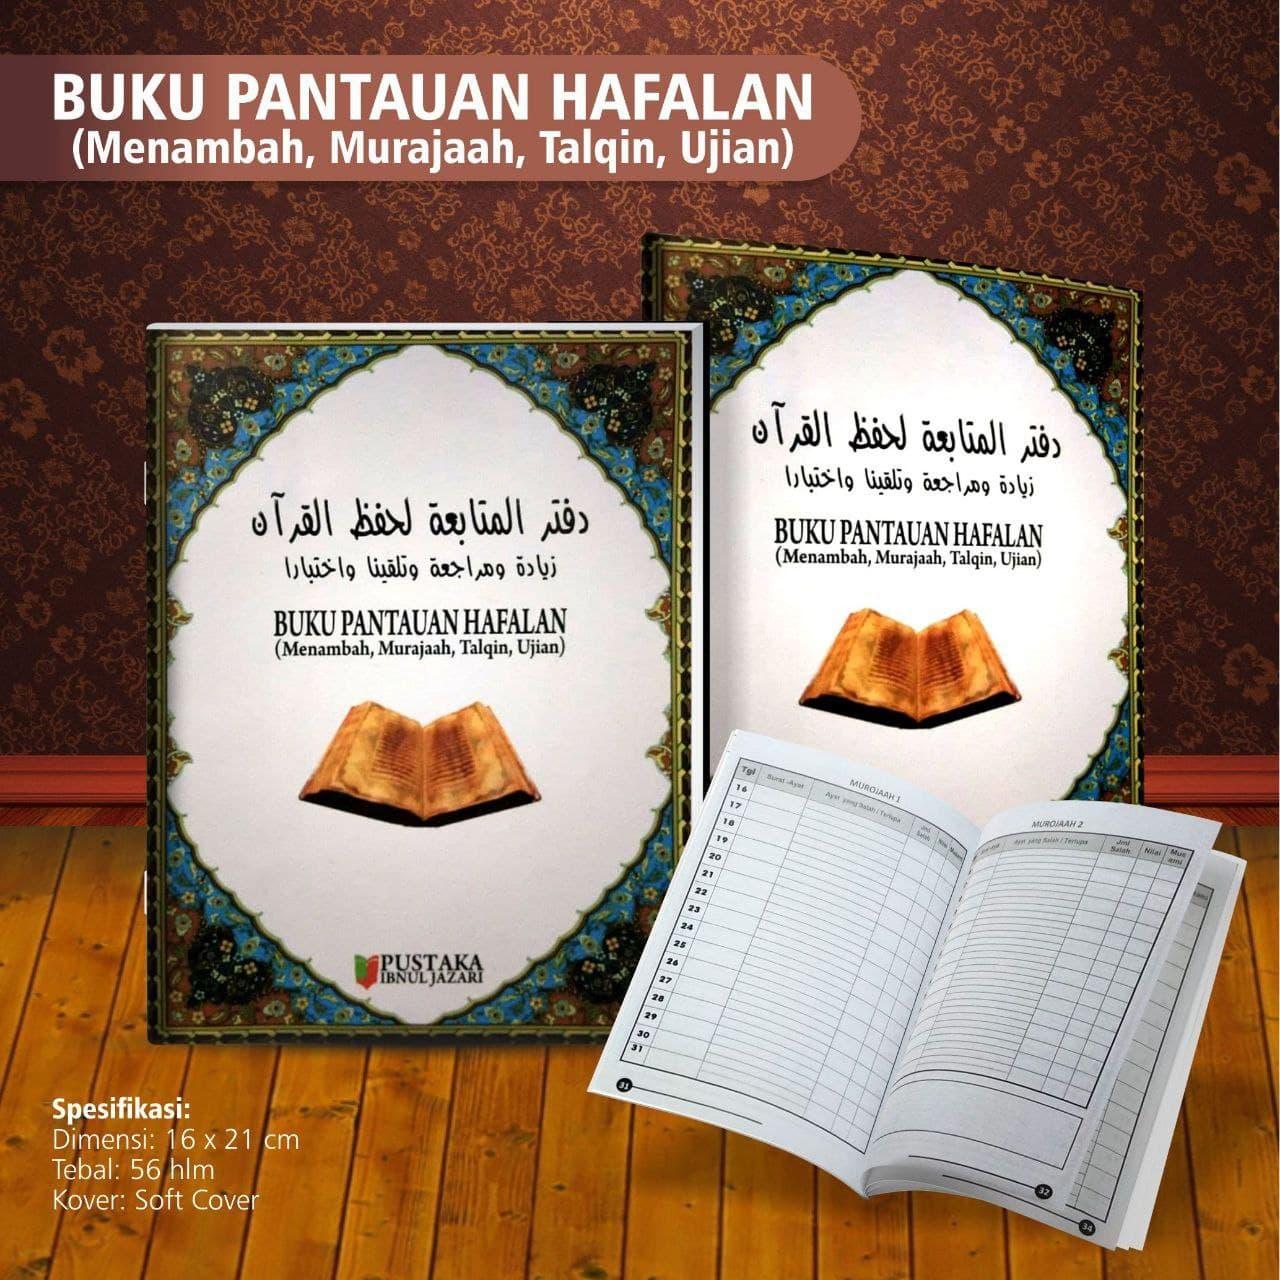 Buku Pantauan Hafalan